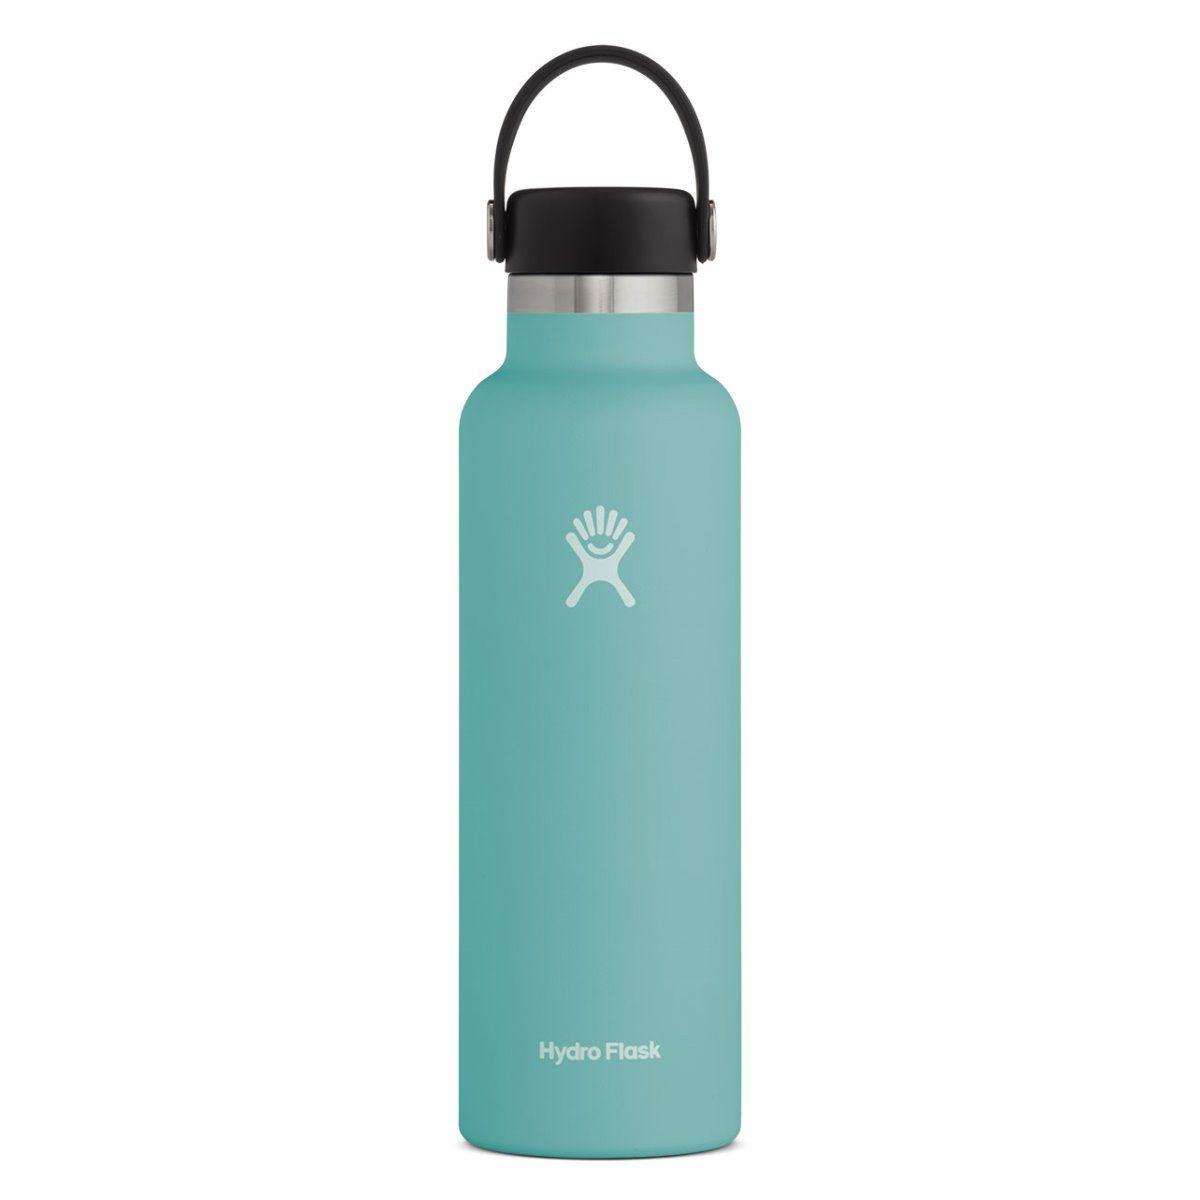 Hydroflask 21 oz standard cap alpine